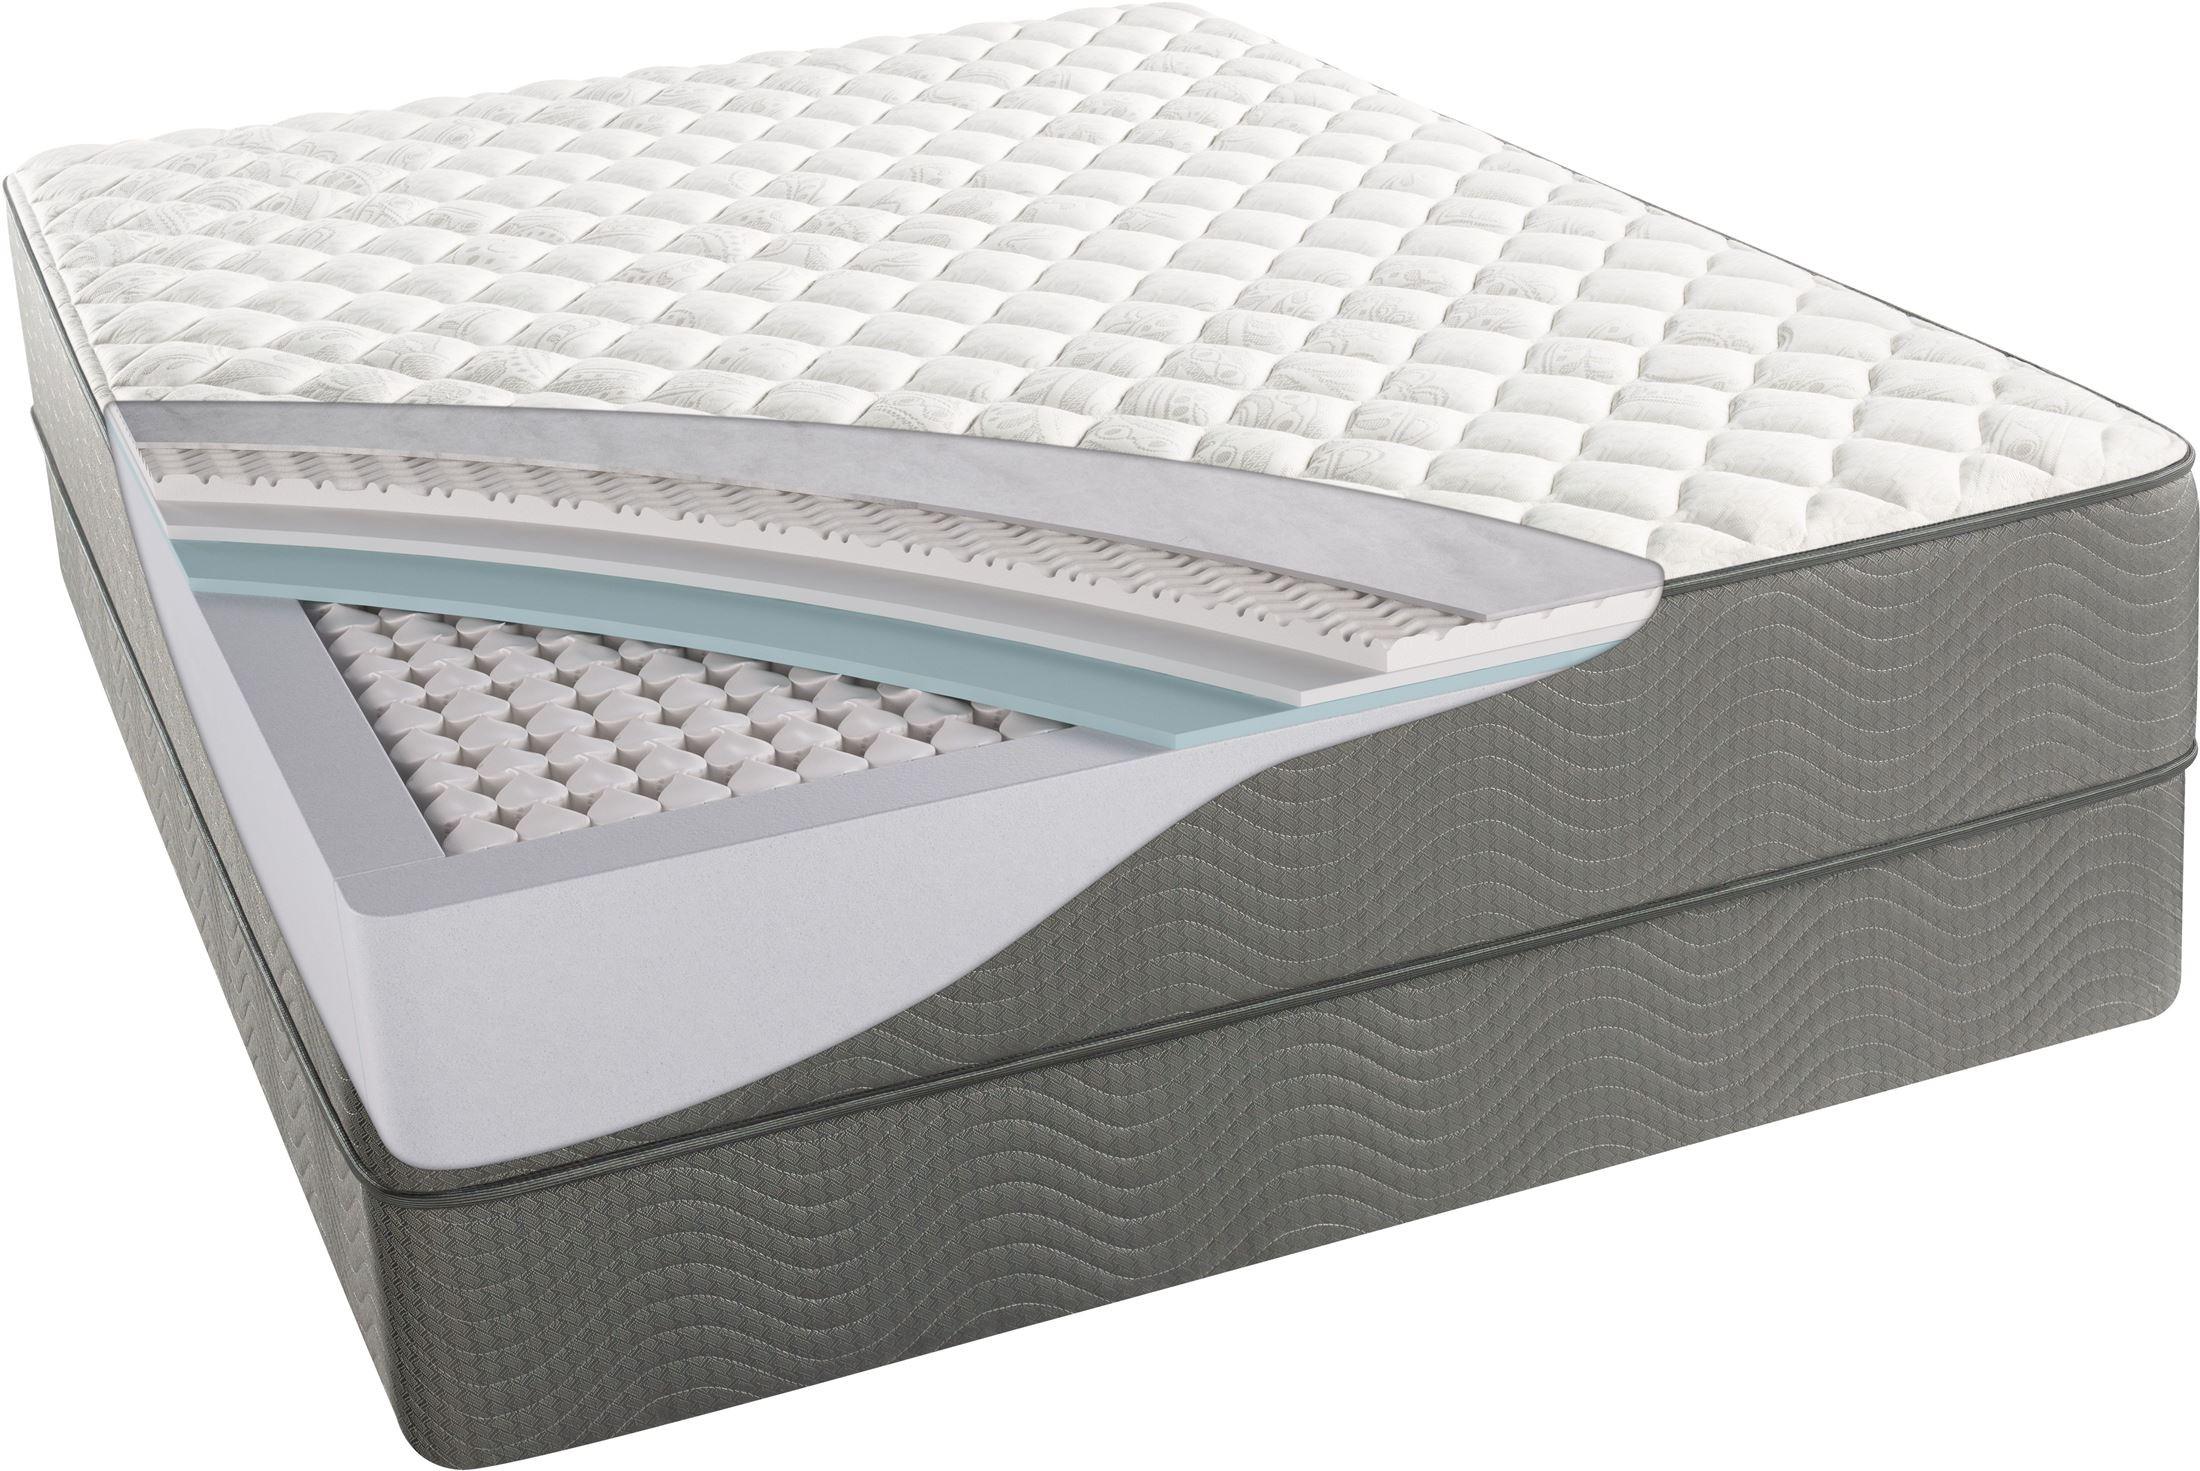 Beautysleep alexander heights tight top firm cal king for Best price on king size mattress set